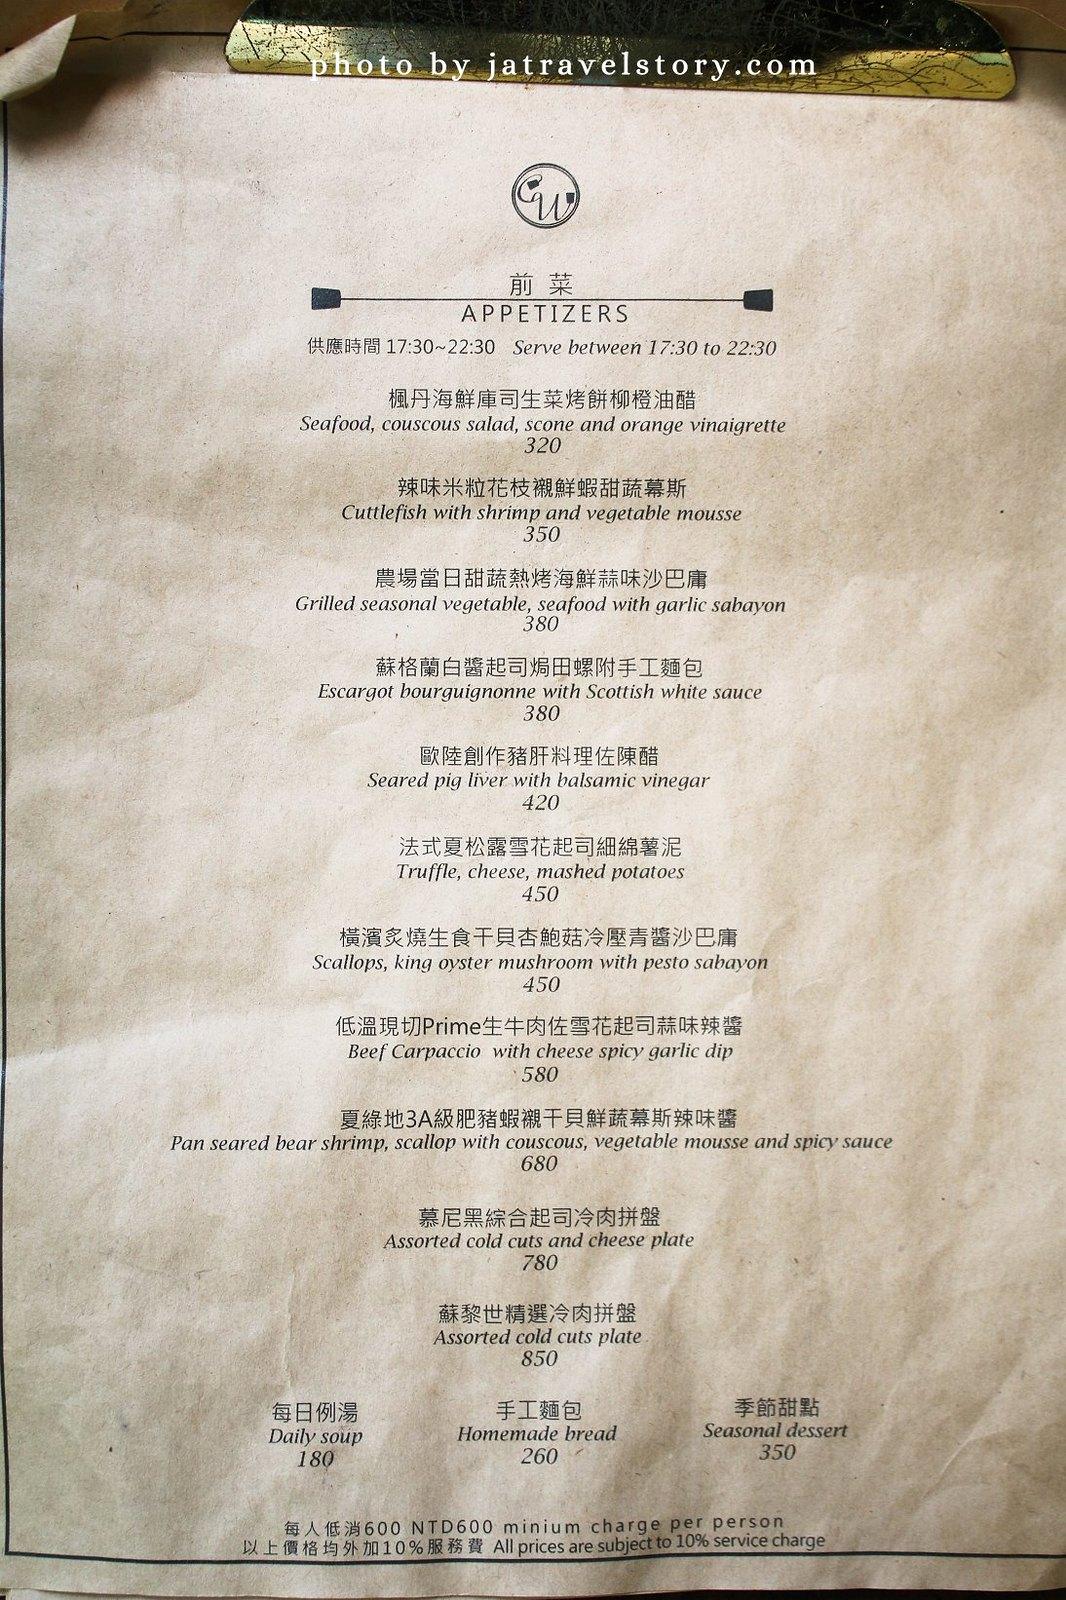 Chinese Whispers 悄悄話餐酒館 浮誇調酒超吸睛!好拍又好吃的東區餐酒館、聚餐餐廳推薦【捷運忠孝敦化】 @J&A的旅行